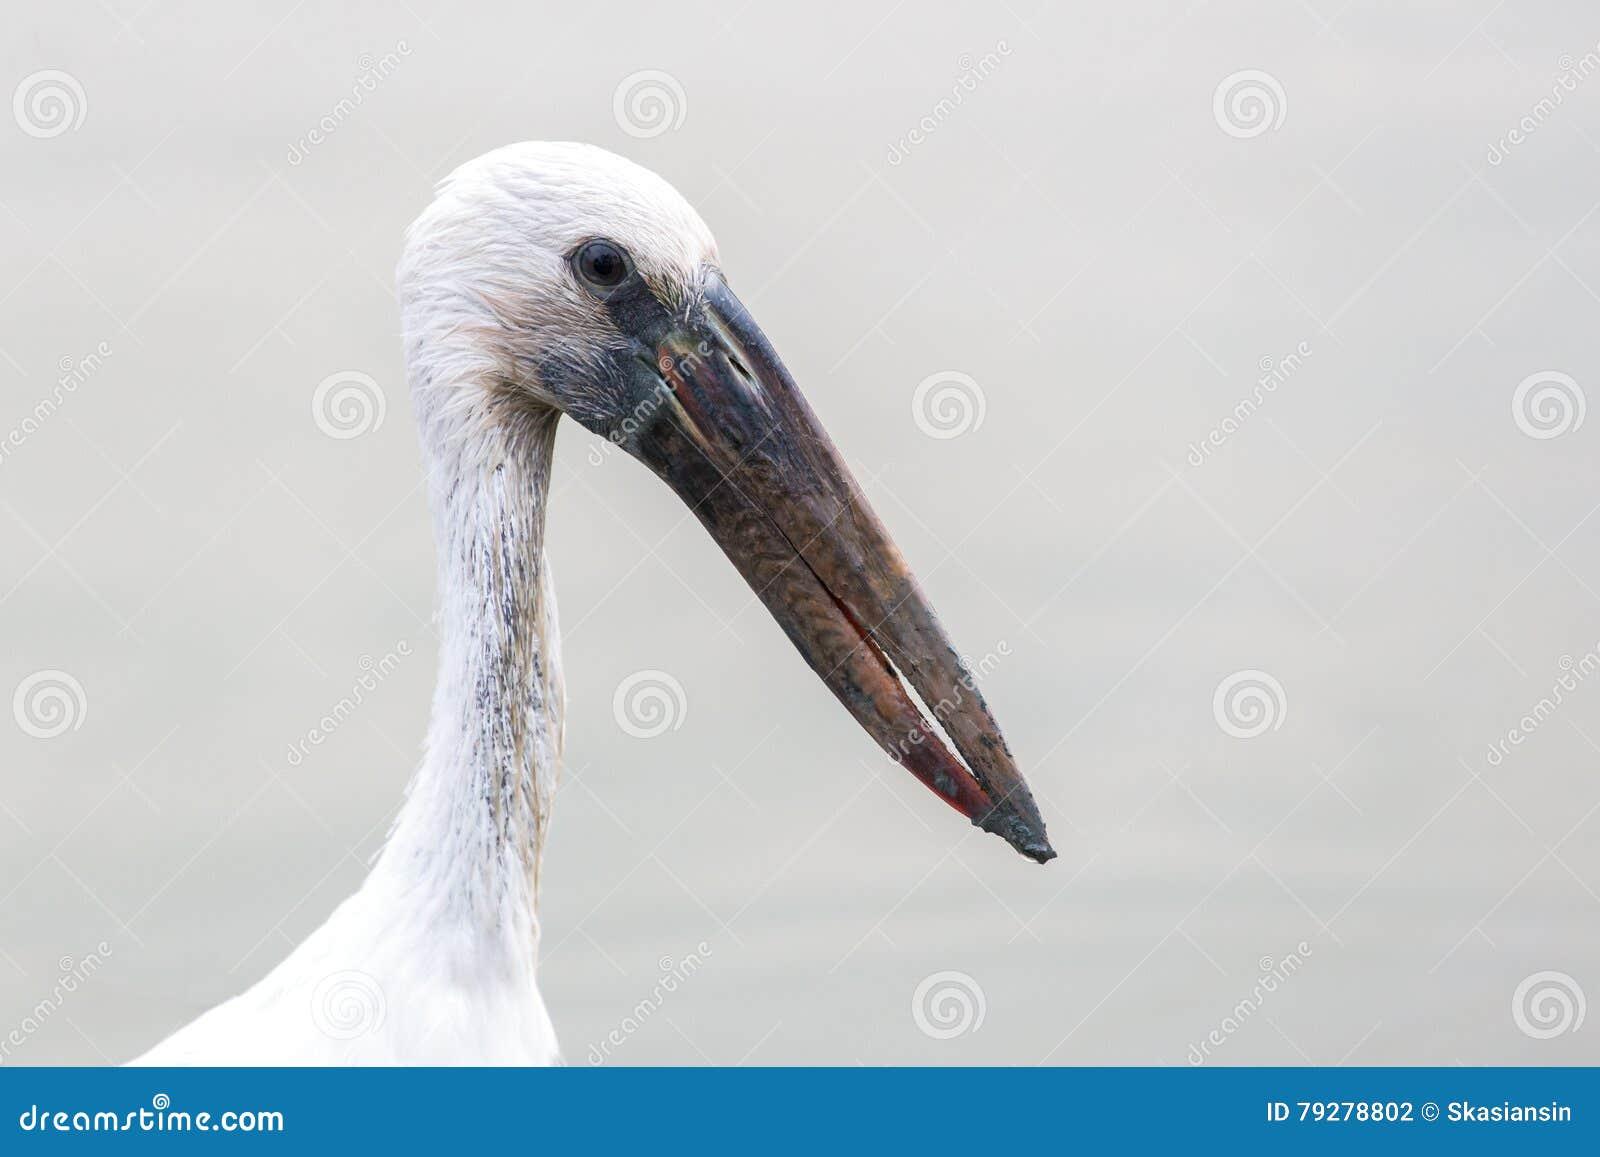 white bird asian singles Search results for white slur  because bird shit is mainly white: bird turd: whites: bird shit is white  asian/white mix: rice king: whites:.